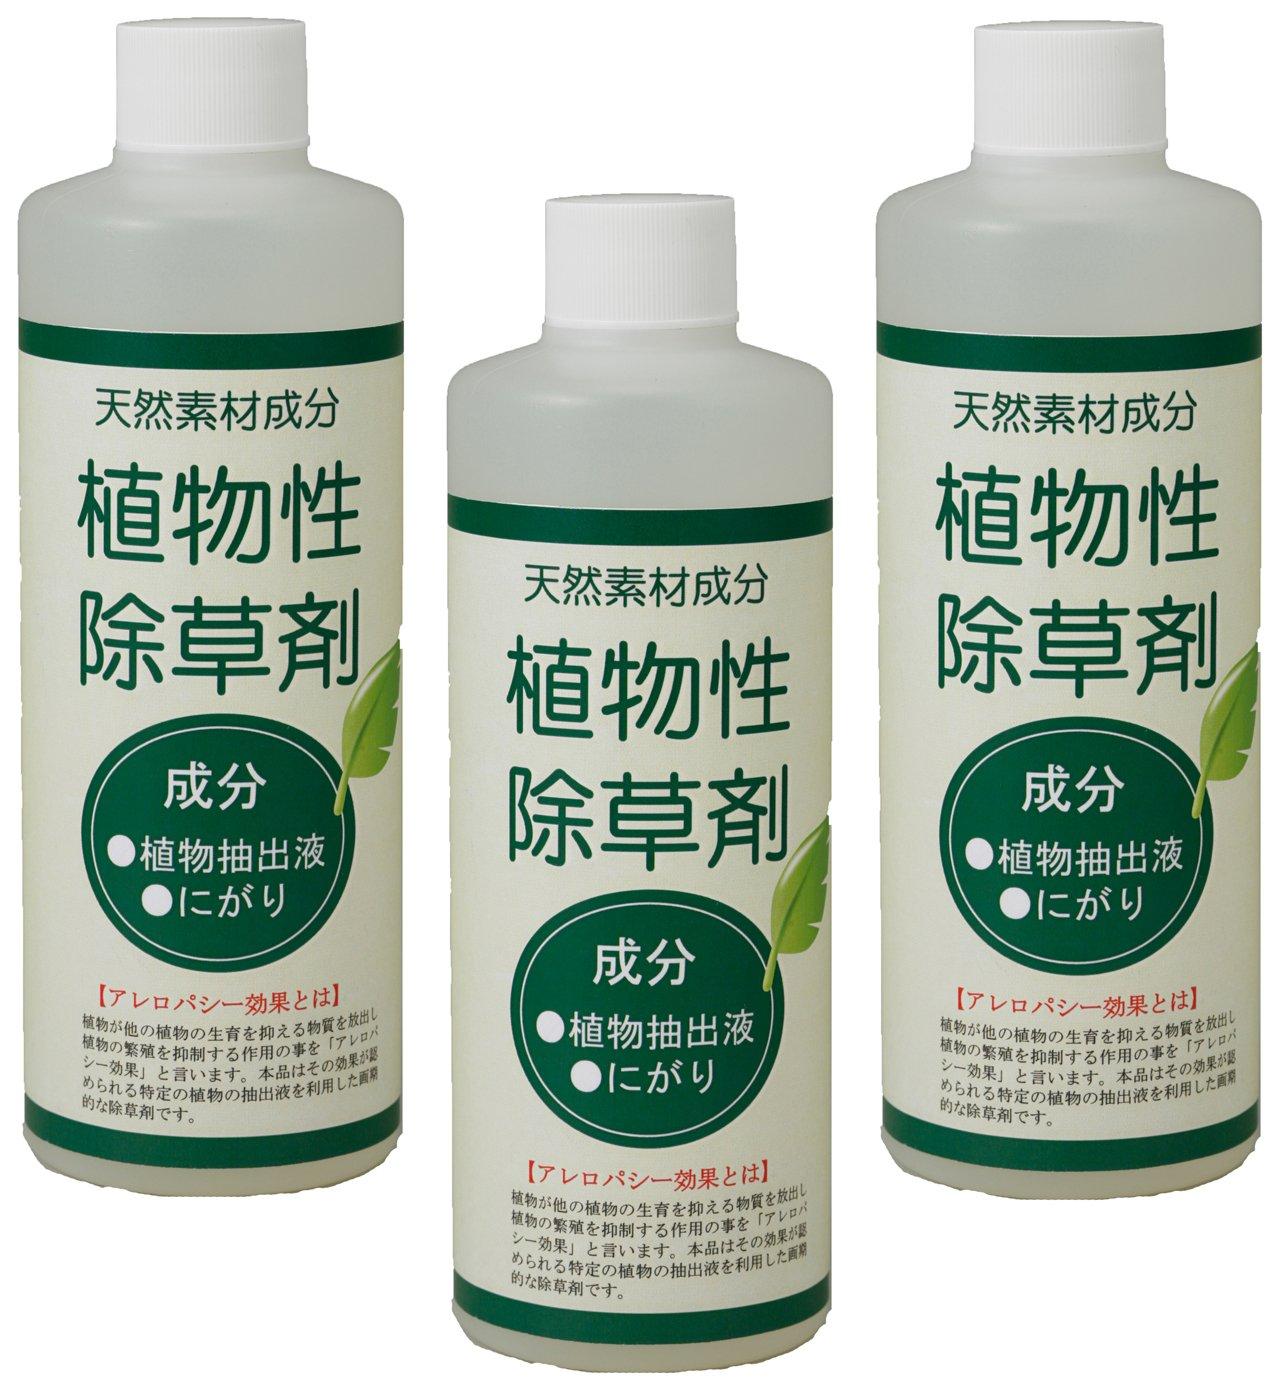 植物性「除草剤」 300ml お徳用3本組み B00GQQ8JPA